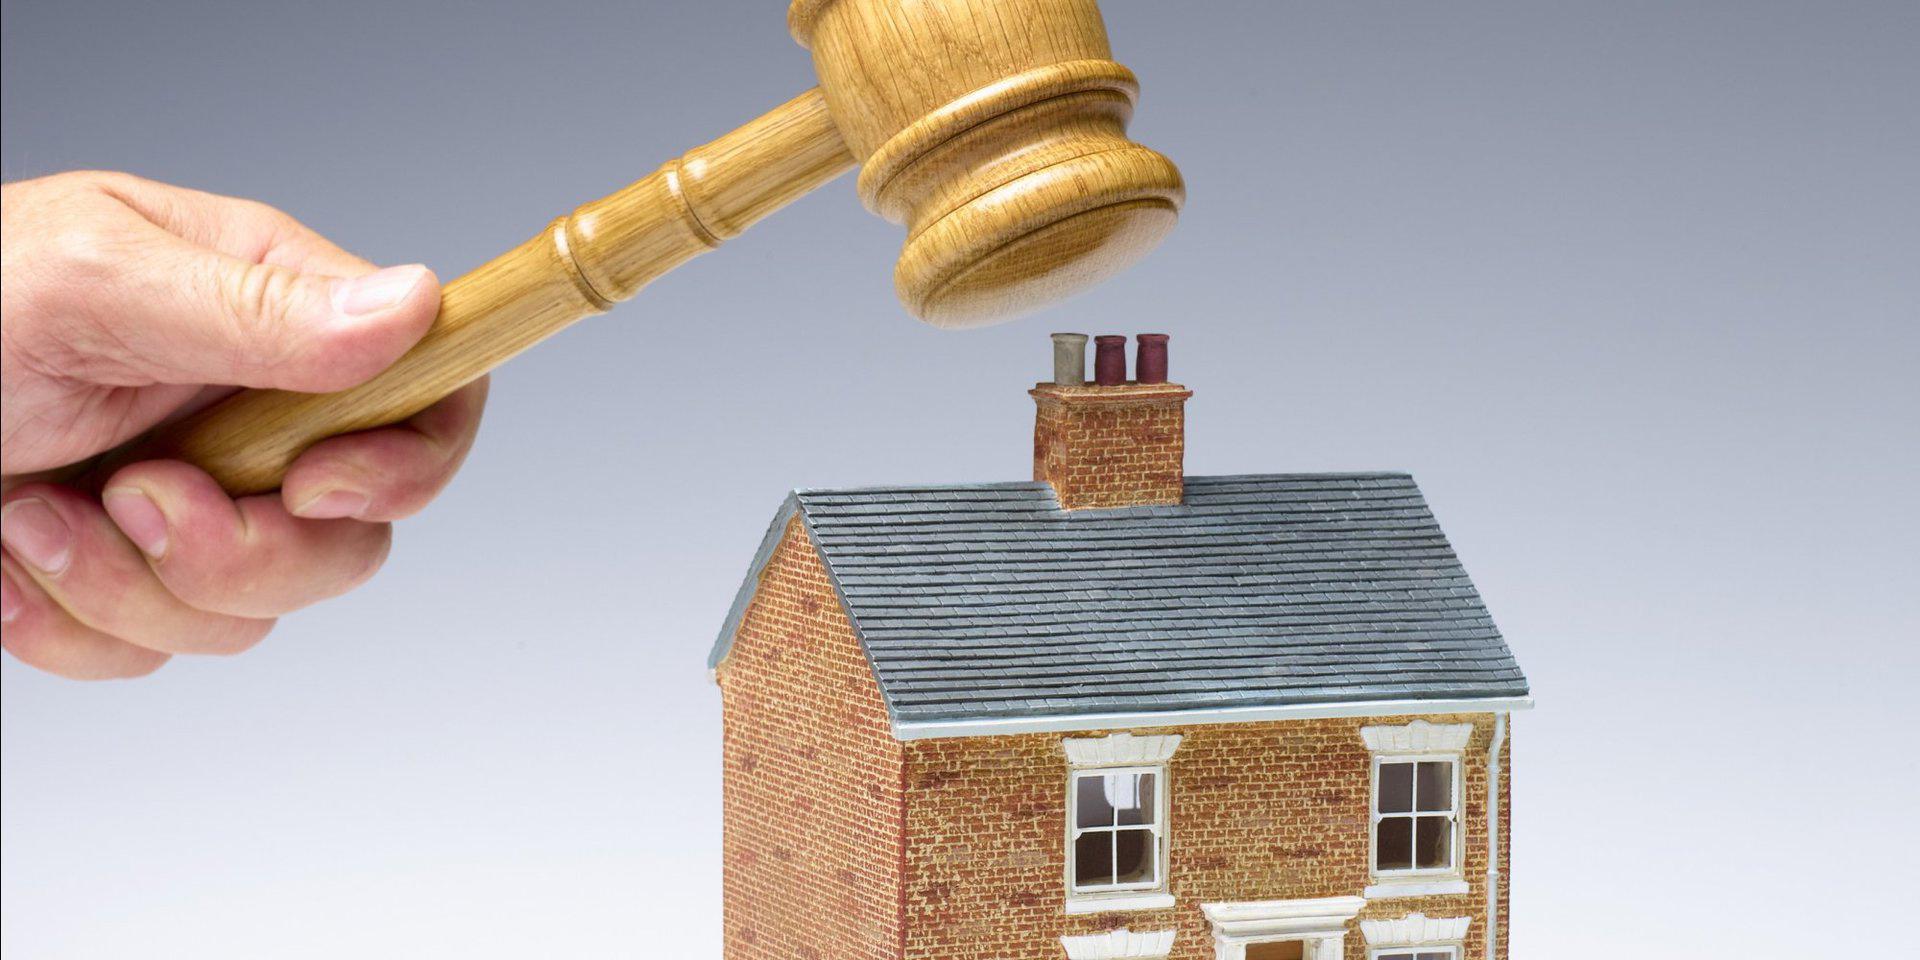 Реализация имущества при банкротстве физических лиц